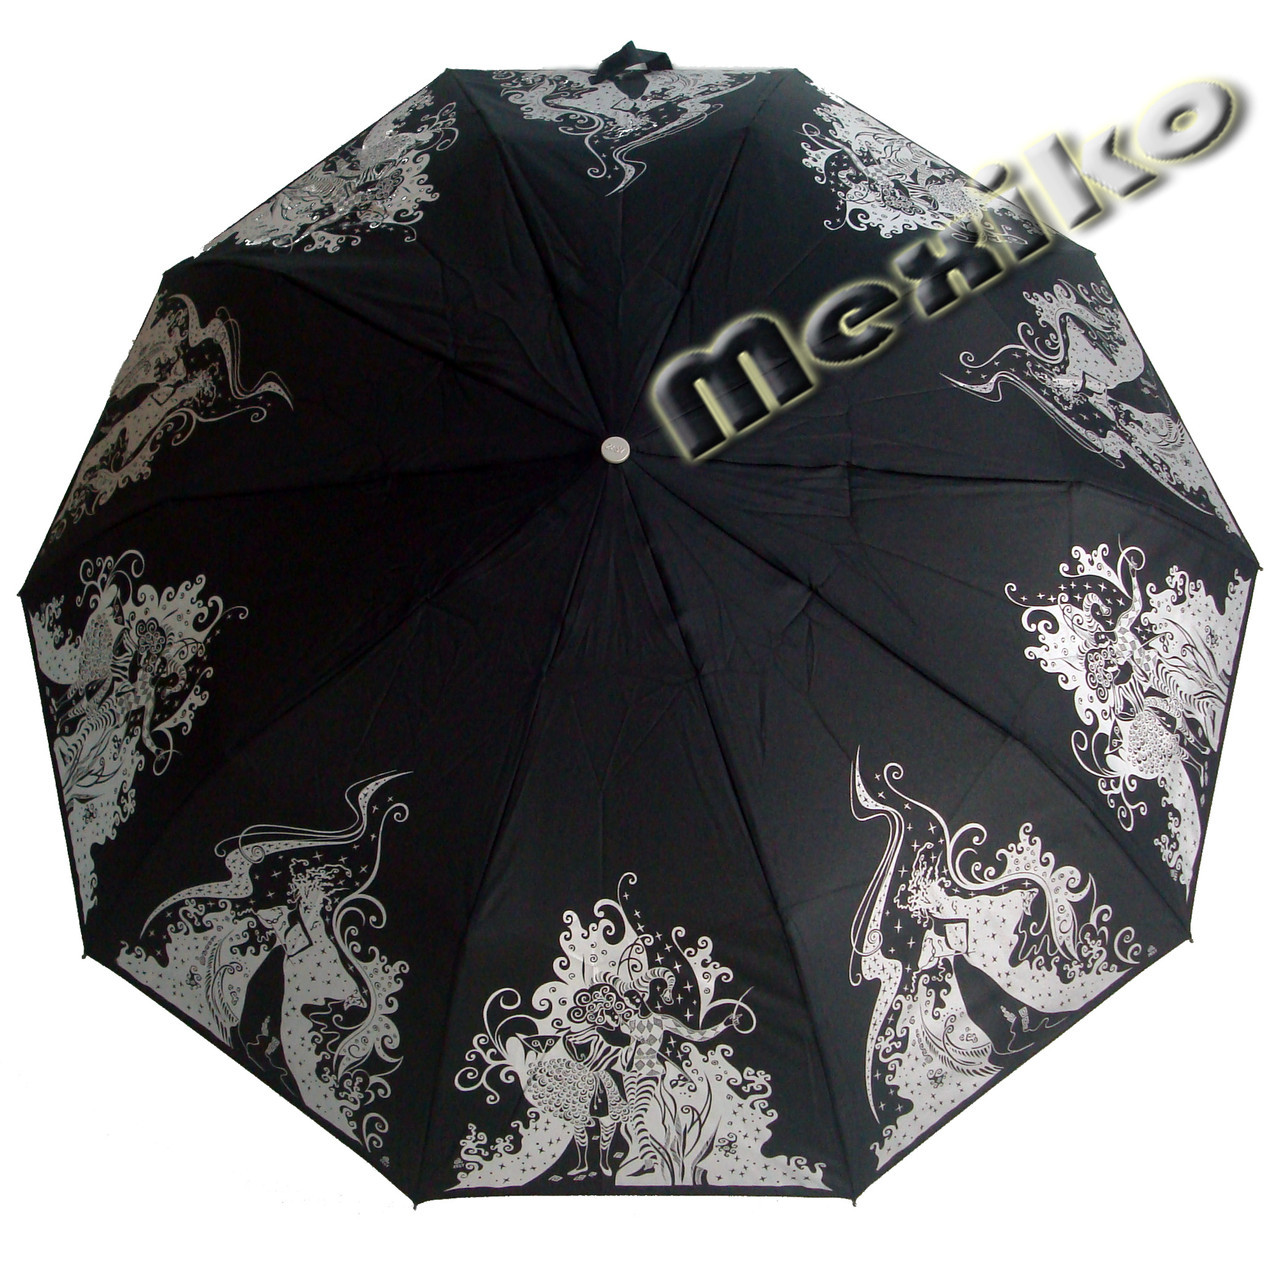 Зонт ZEST, полуавтомат серия 10 спиц, расцветка Маскарад